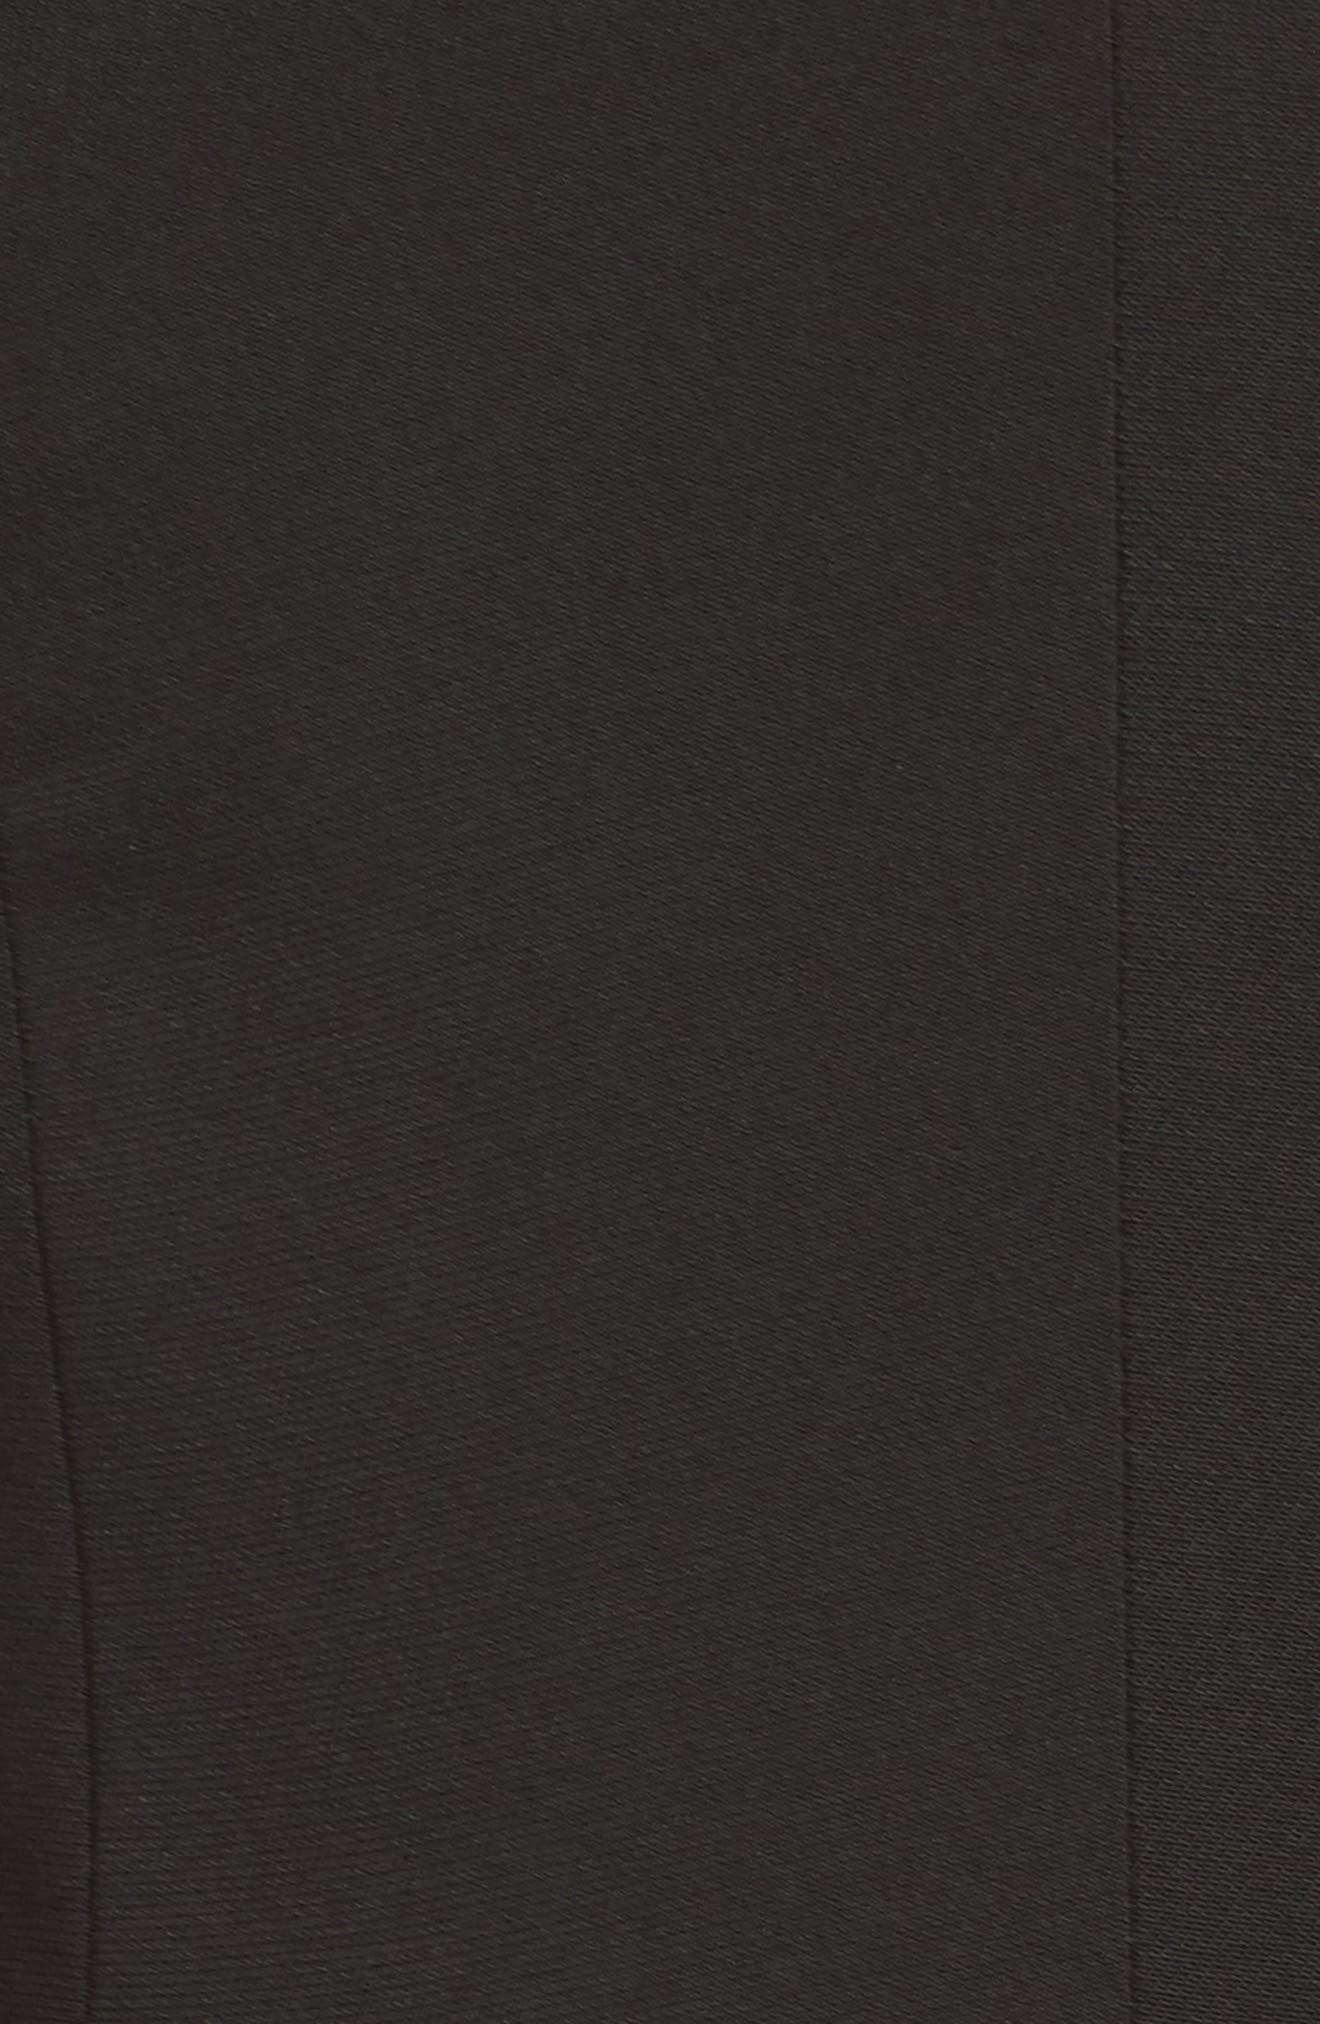 Tamika Sleeveless Fit & Flare Dress,                             Alternate thumbnail 6, color,                             Black